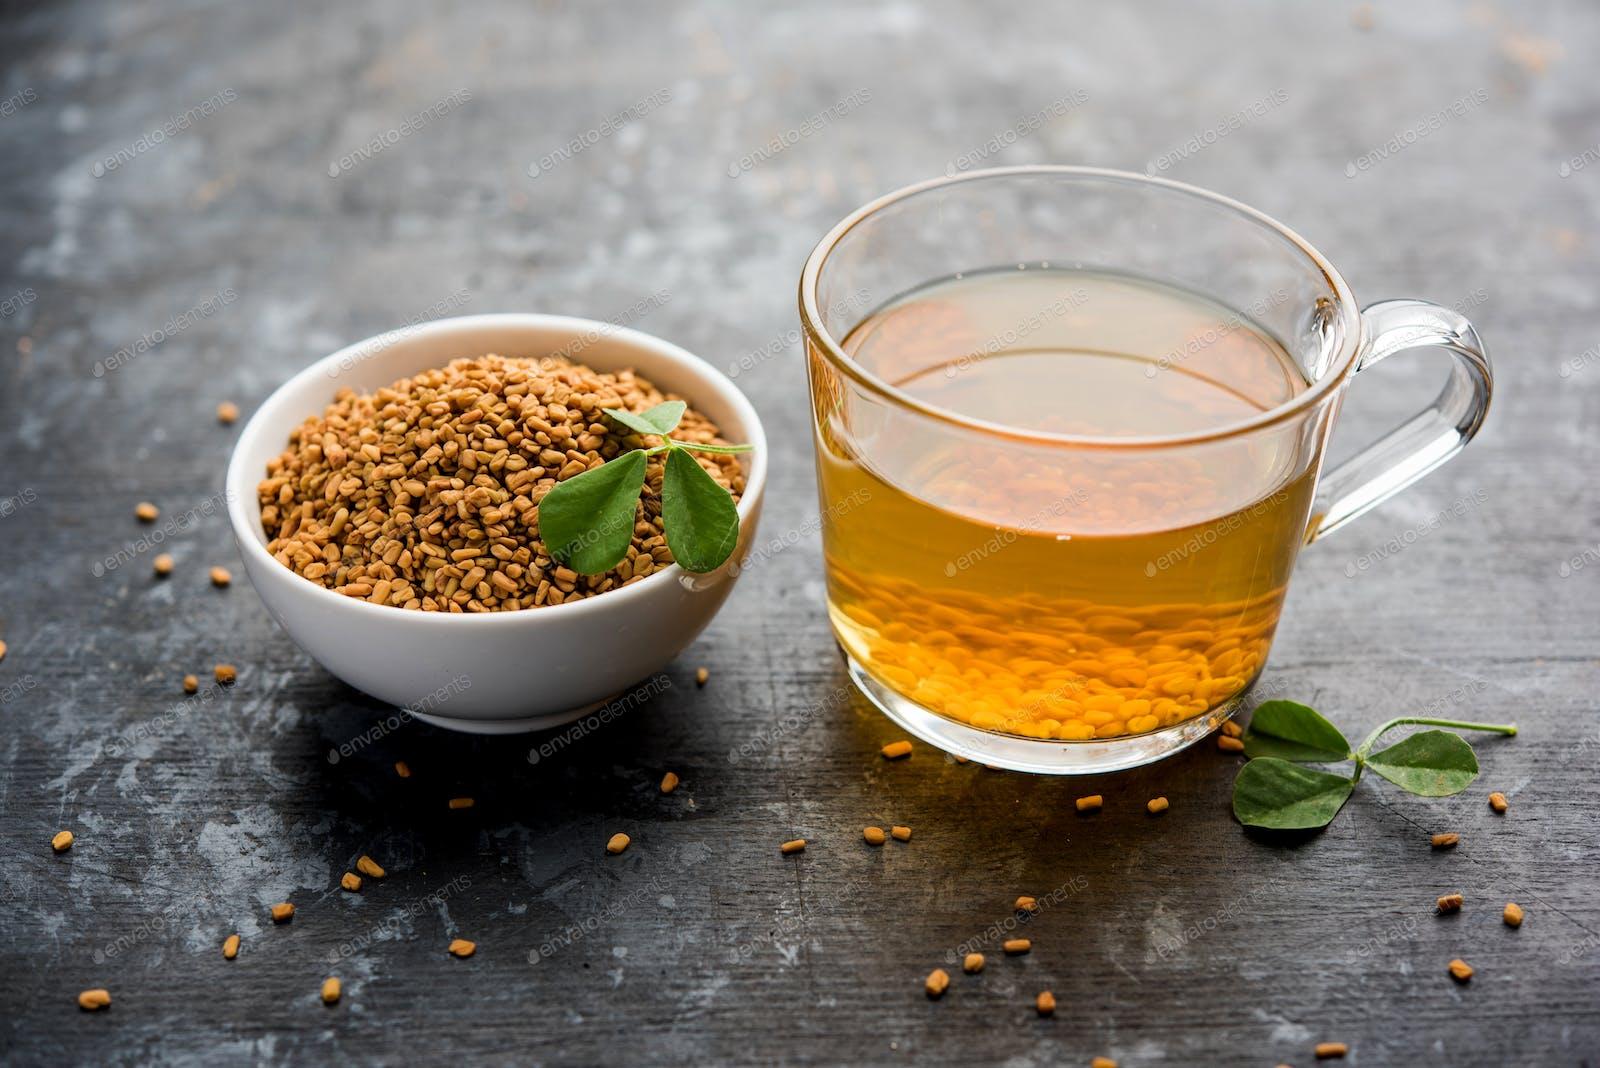 Fenugreek Seeds Or Methi Dana Drink photo by stockimagefactory on Envato Elements